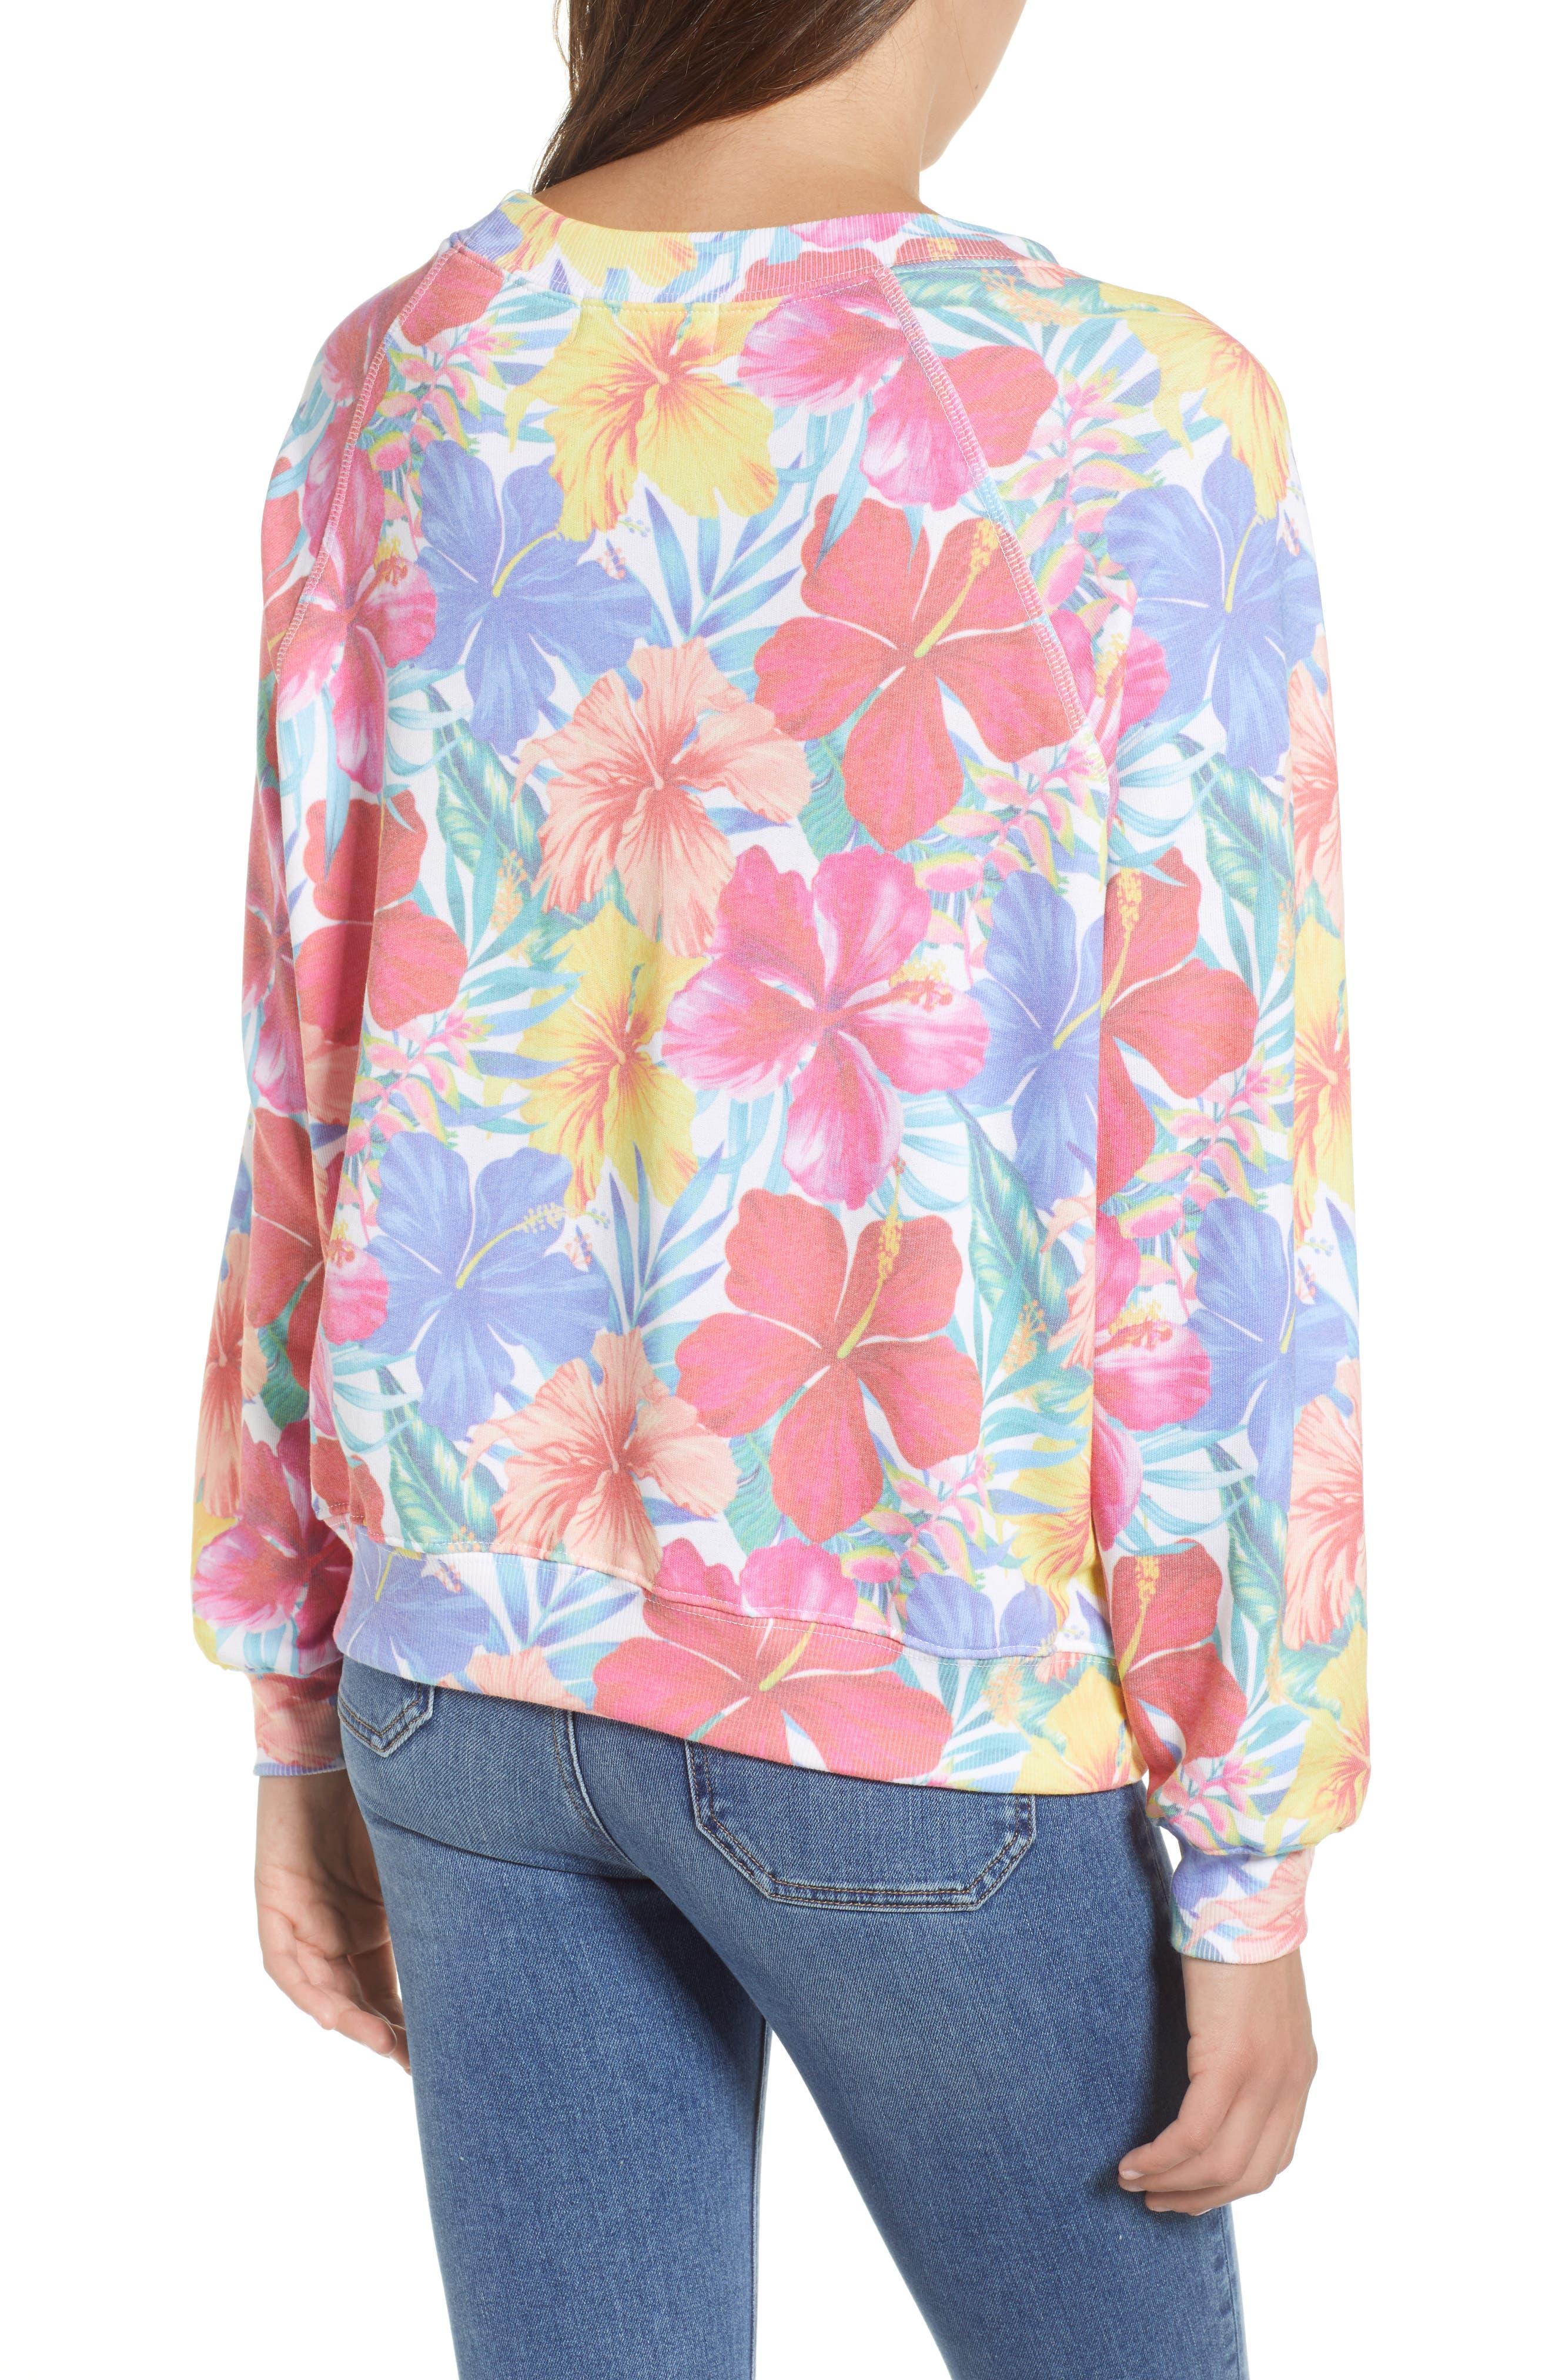 Tropicalia Sommers Sweatshirt,                             Alternate thumbnail 2, color,                             Multi Colored